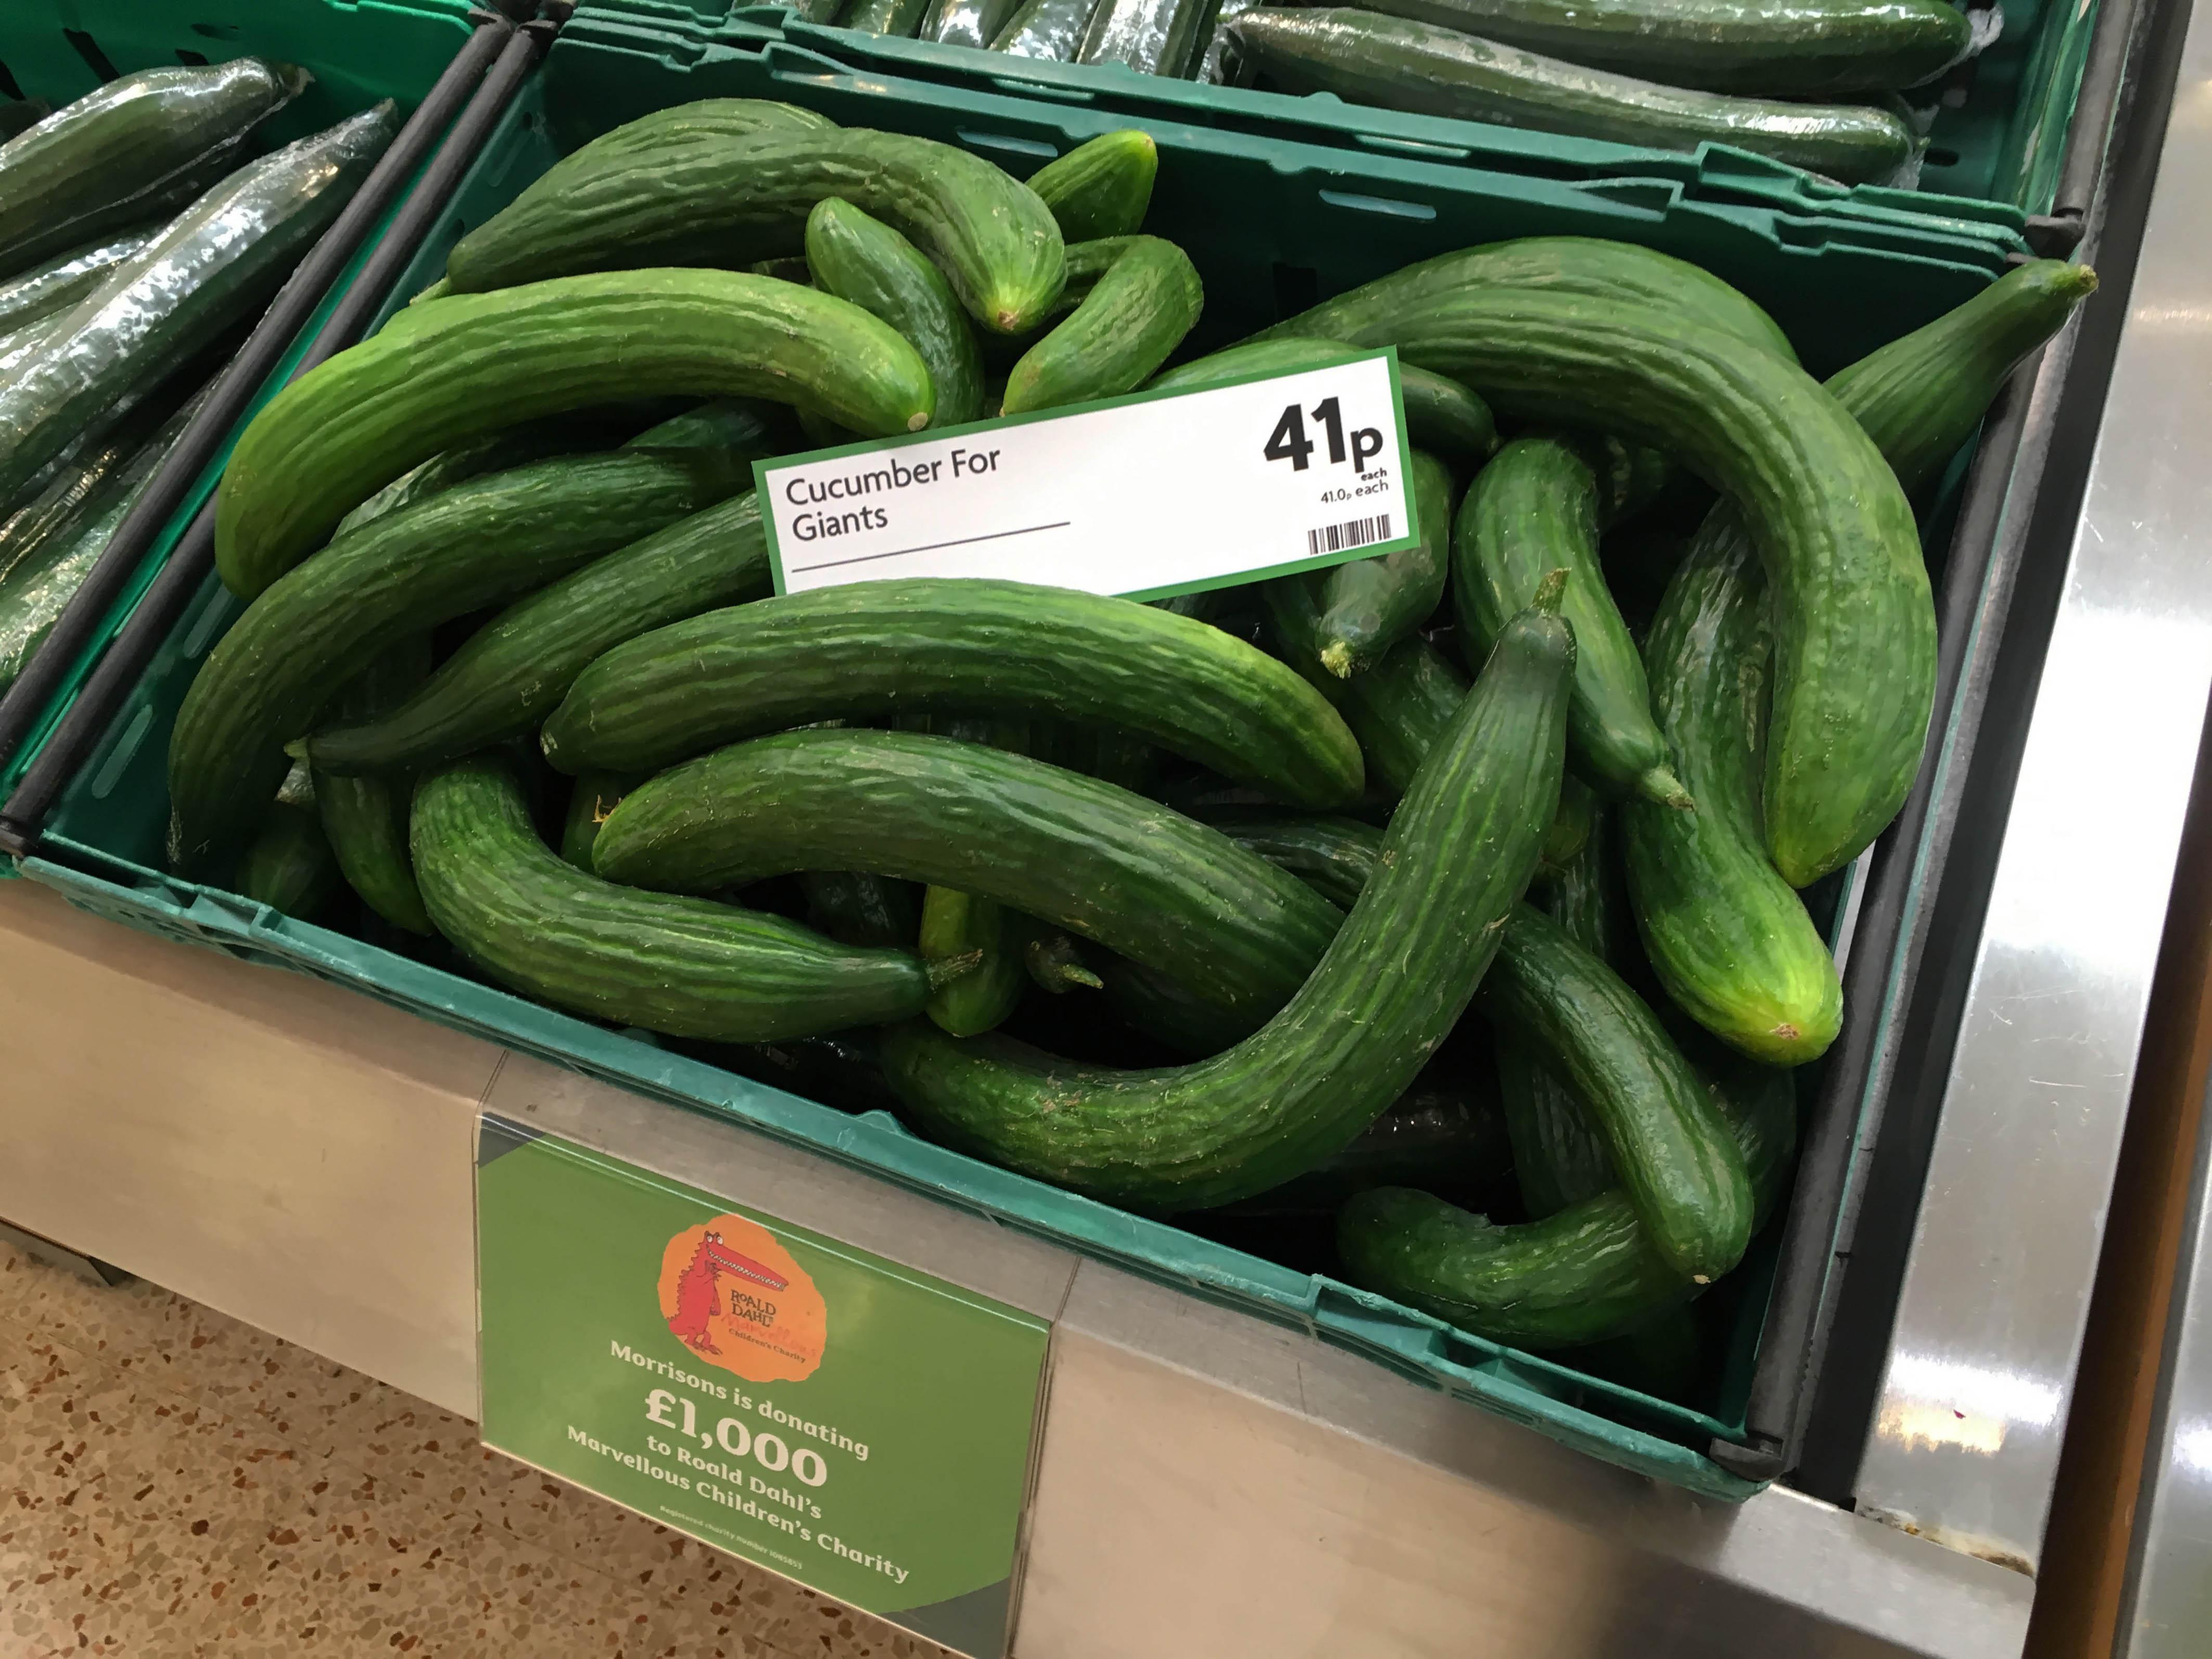 Giant Cucumbers Snozzcumbers